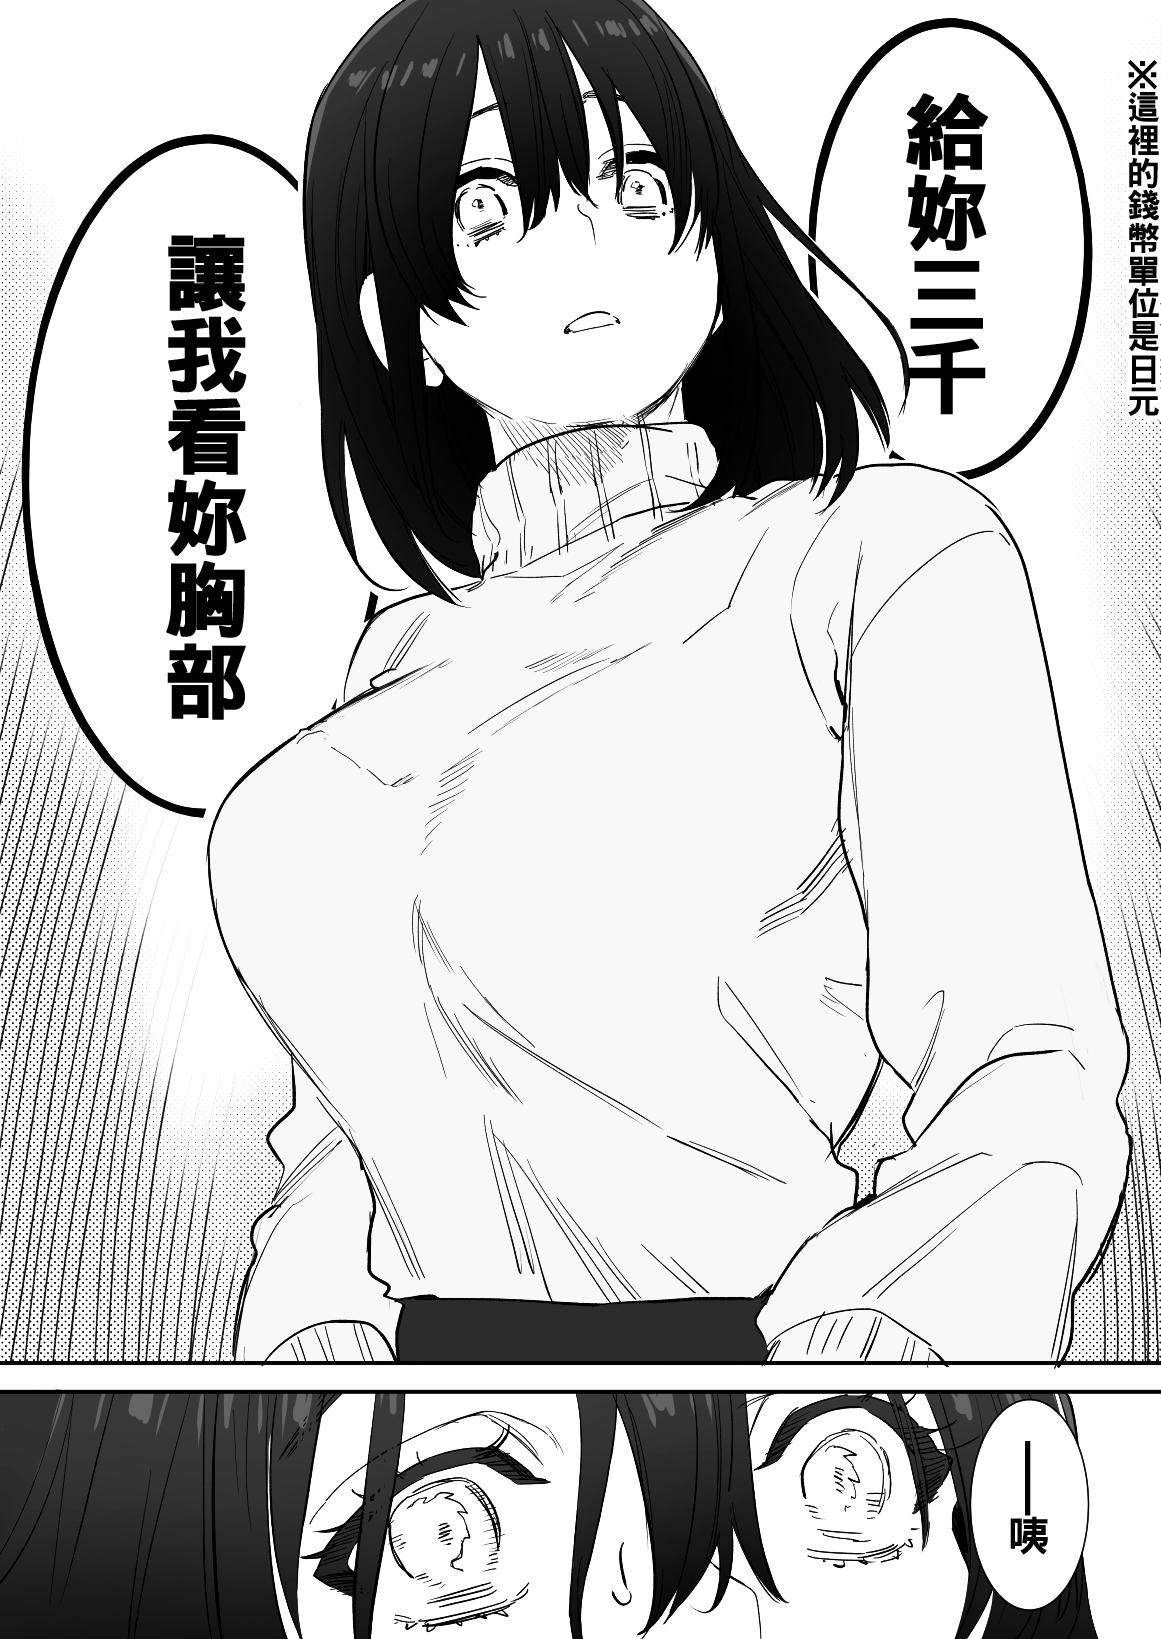 〇sen Yen de Oppai Misete. 11